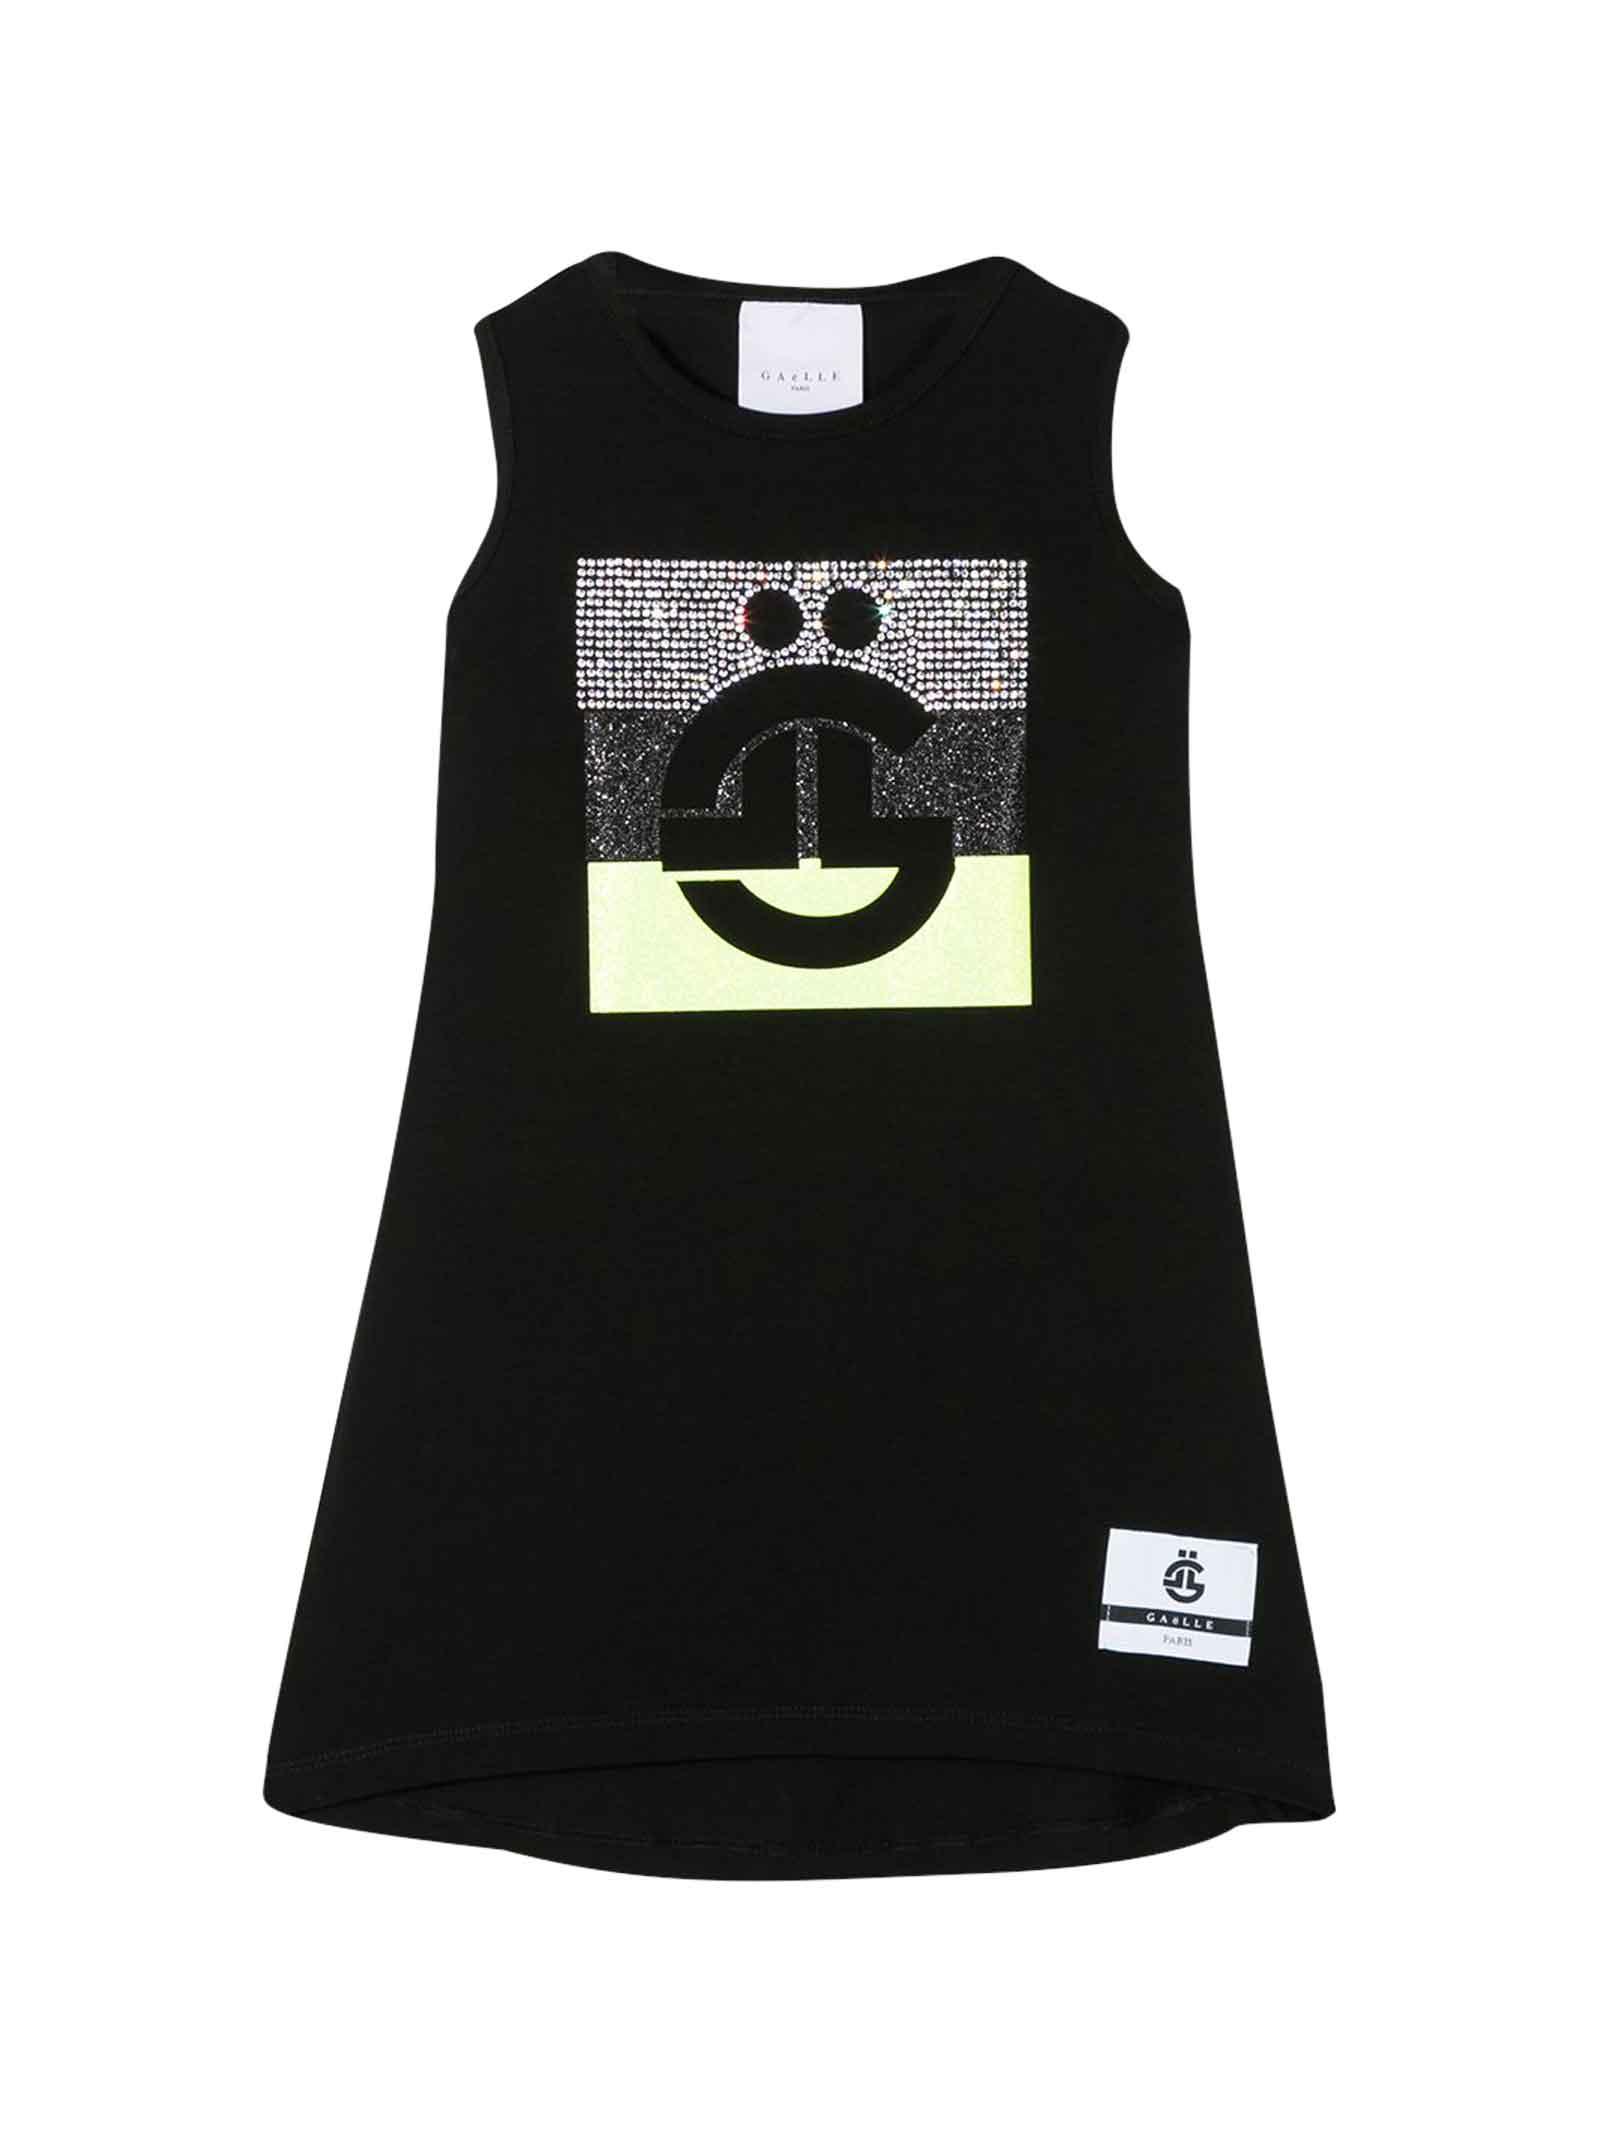 Buy Gaelle Bonheur Black Kids Sleeveless Dress online, shop Gaelle Bonheur with free shipping